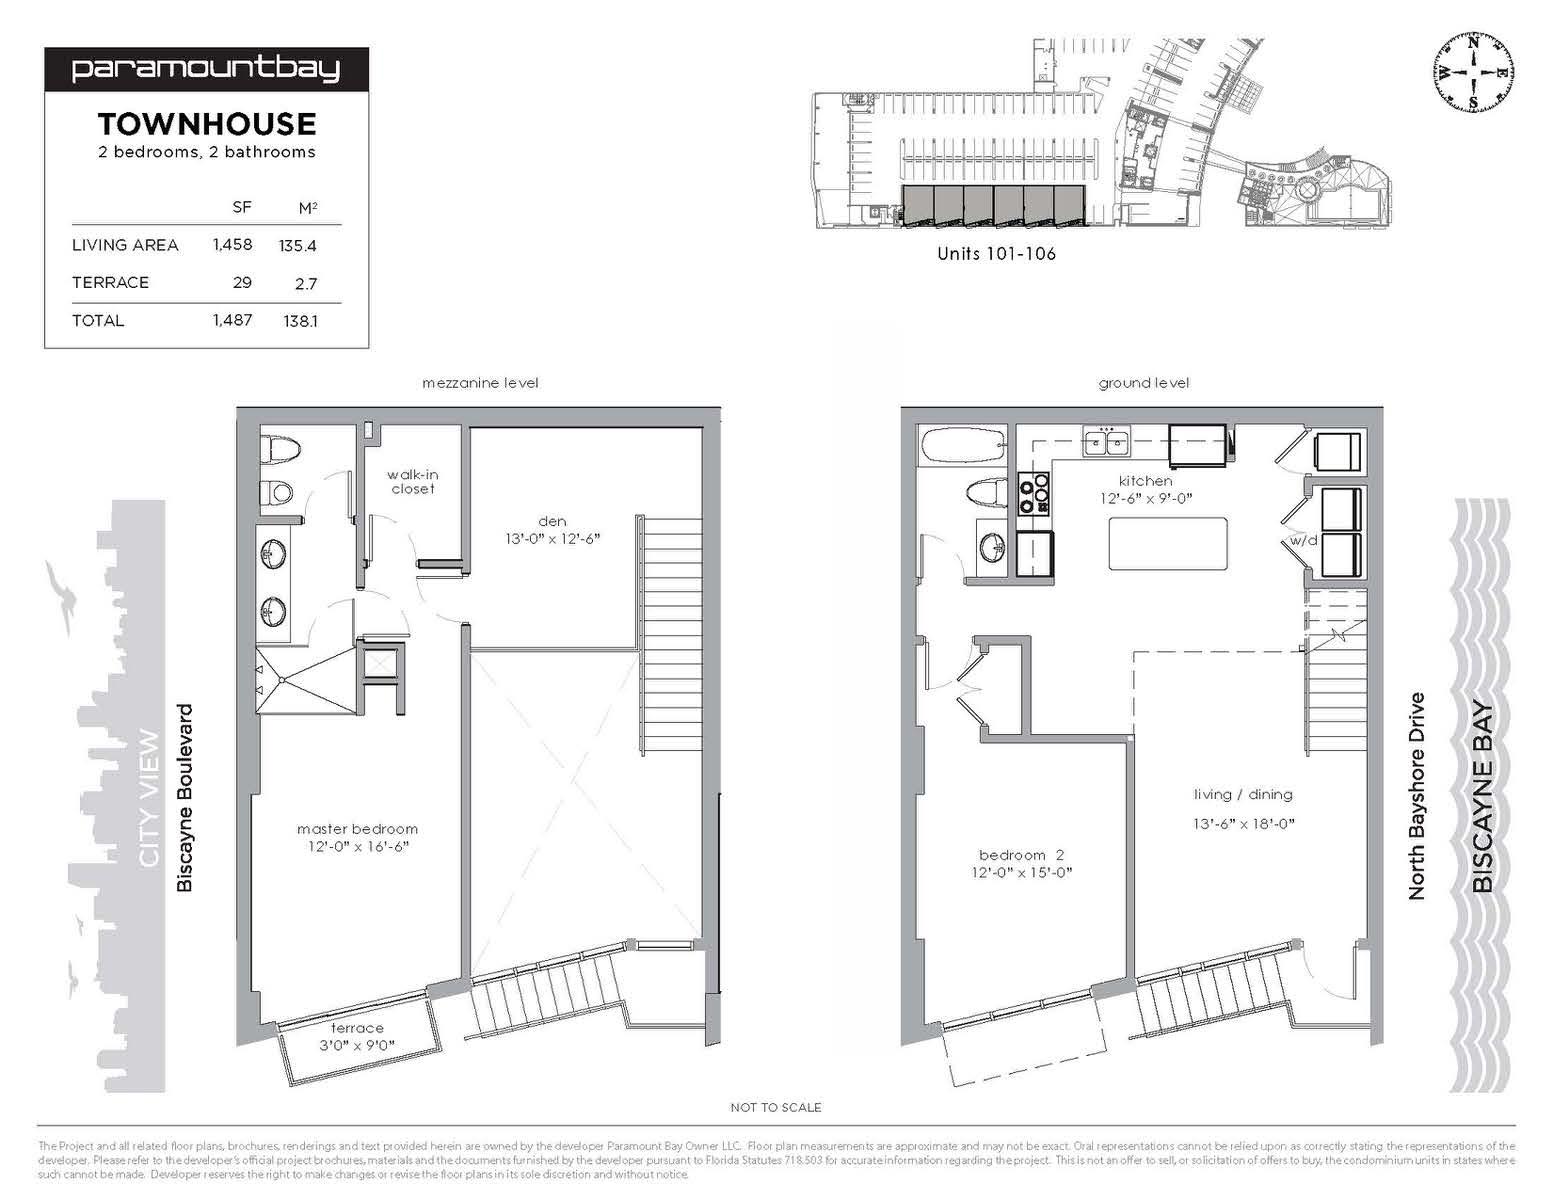 Paramount Bay Miami Floorplan